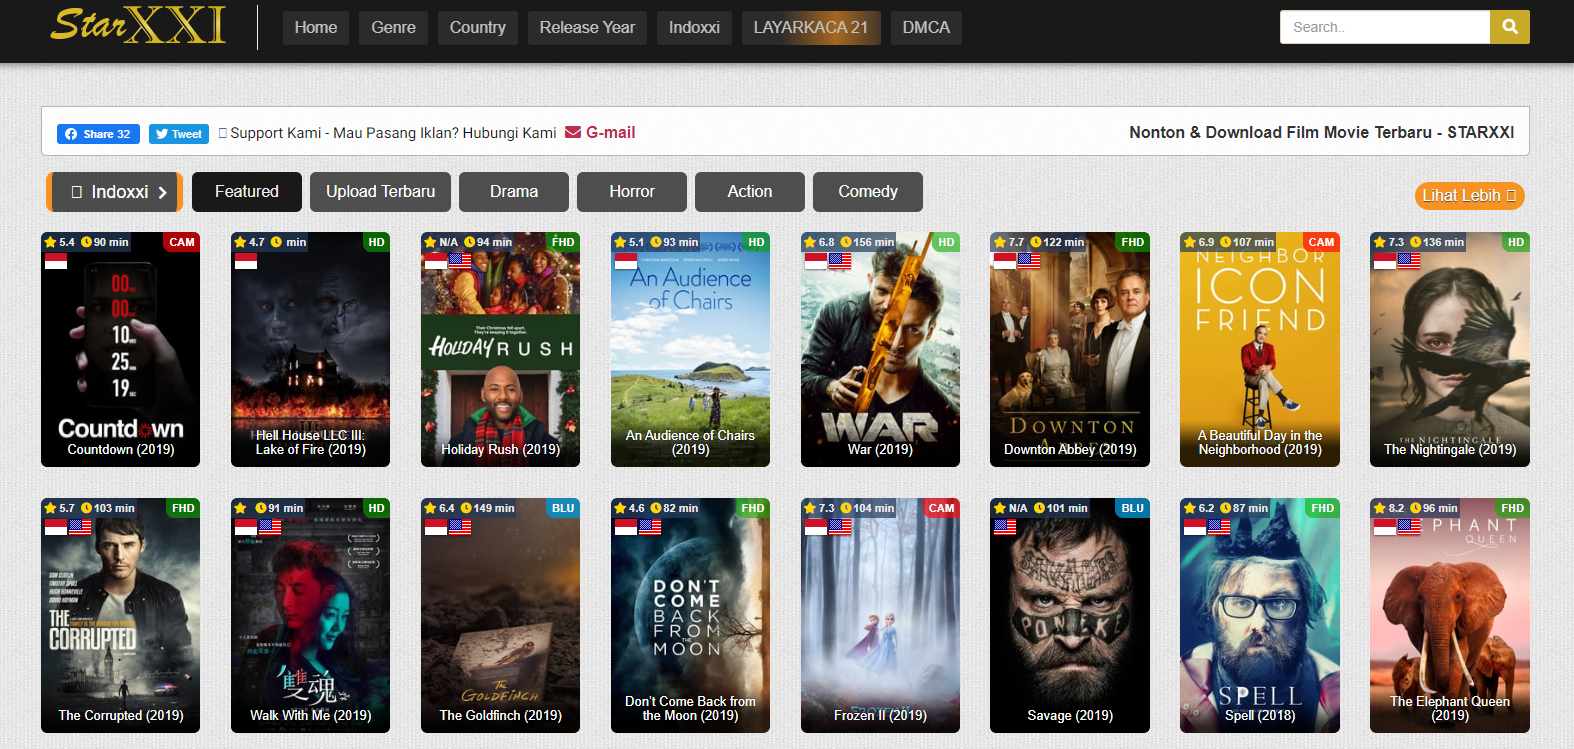 Situs Nonton Film Layarkaca21 Indoxxi LK21 Starxxi